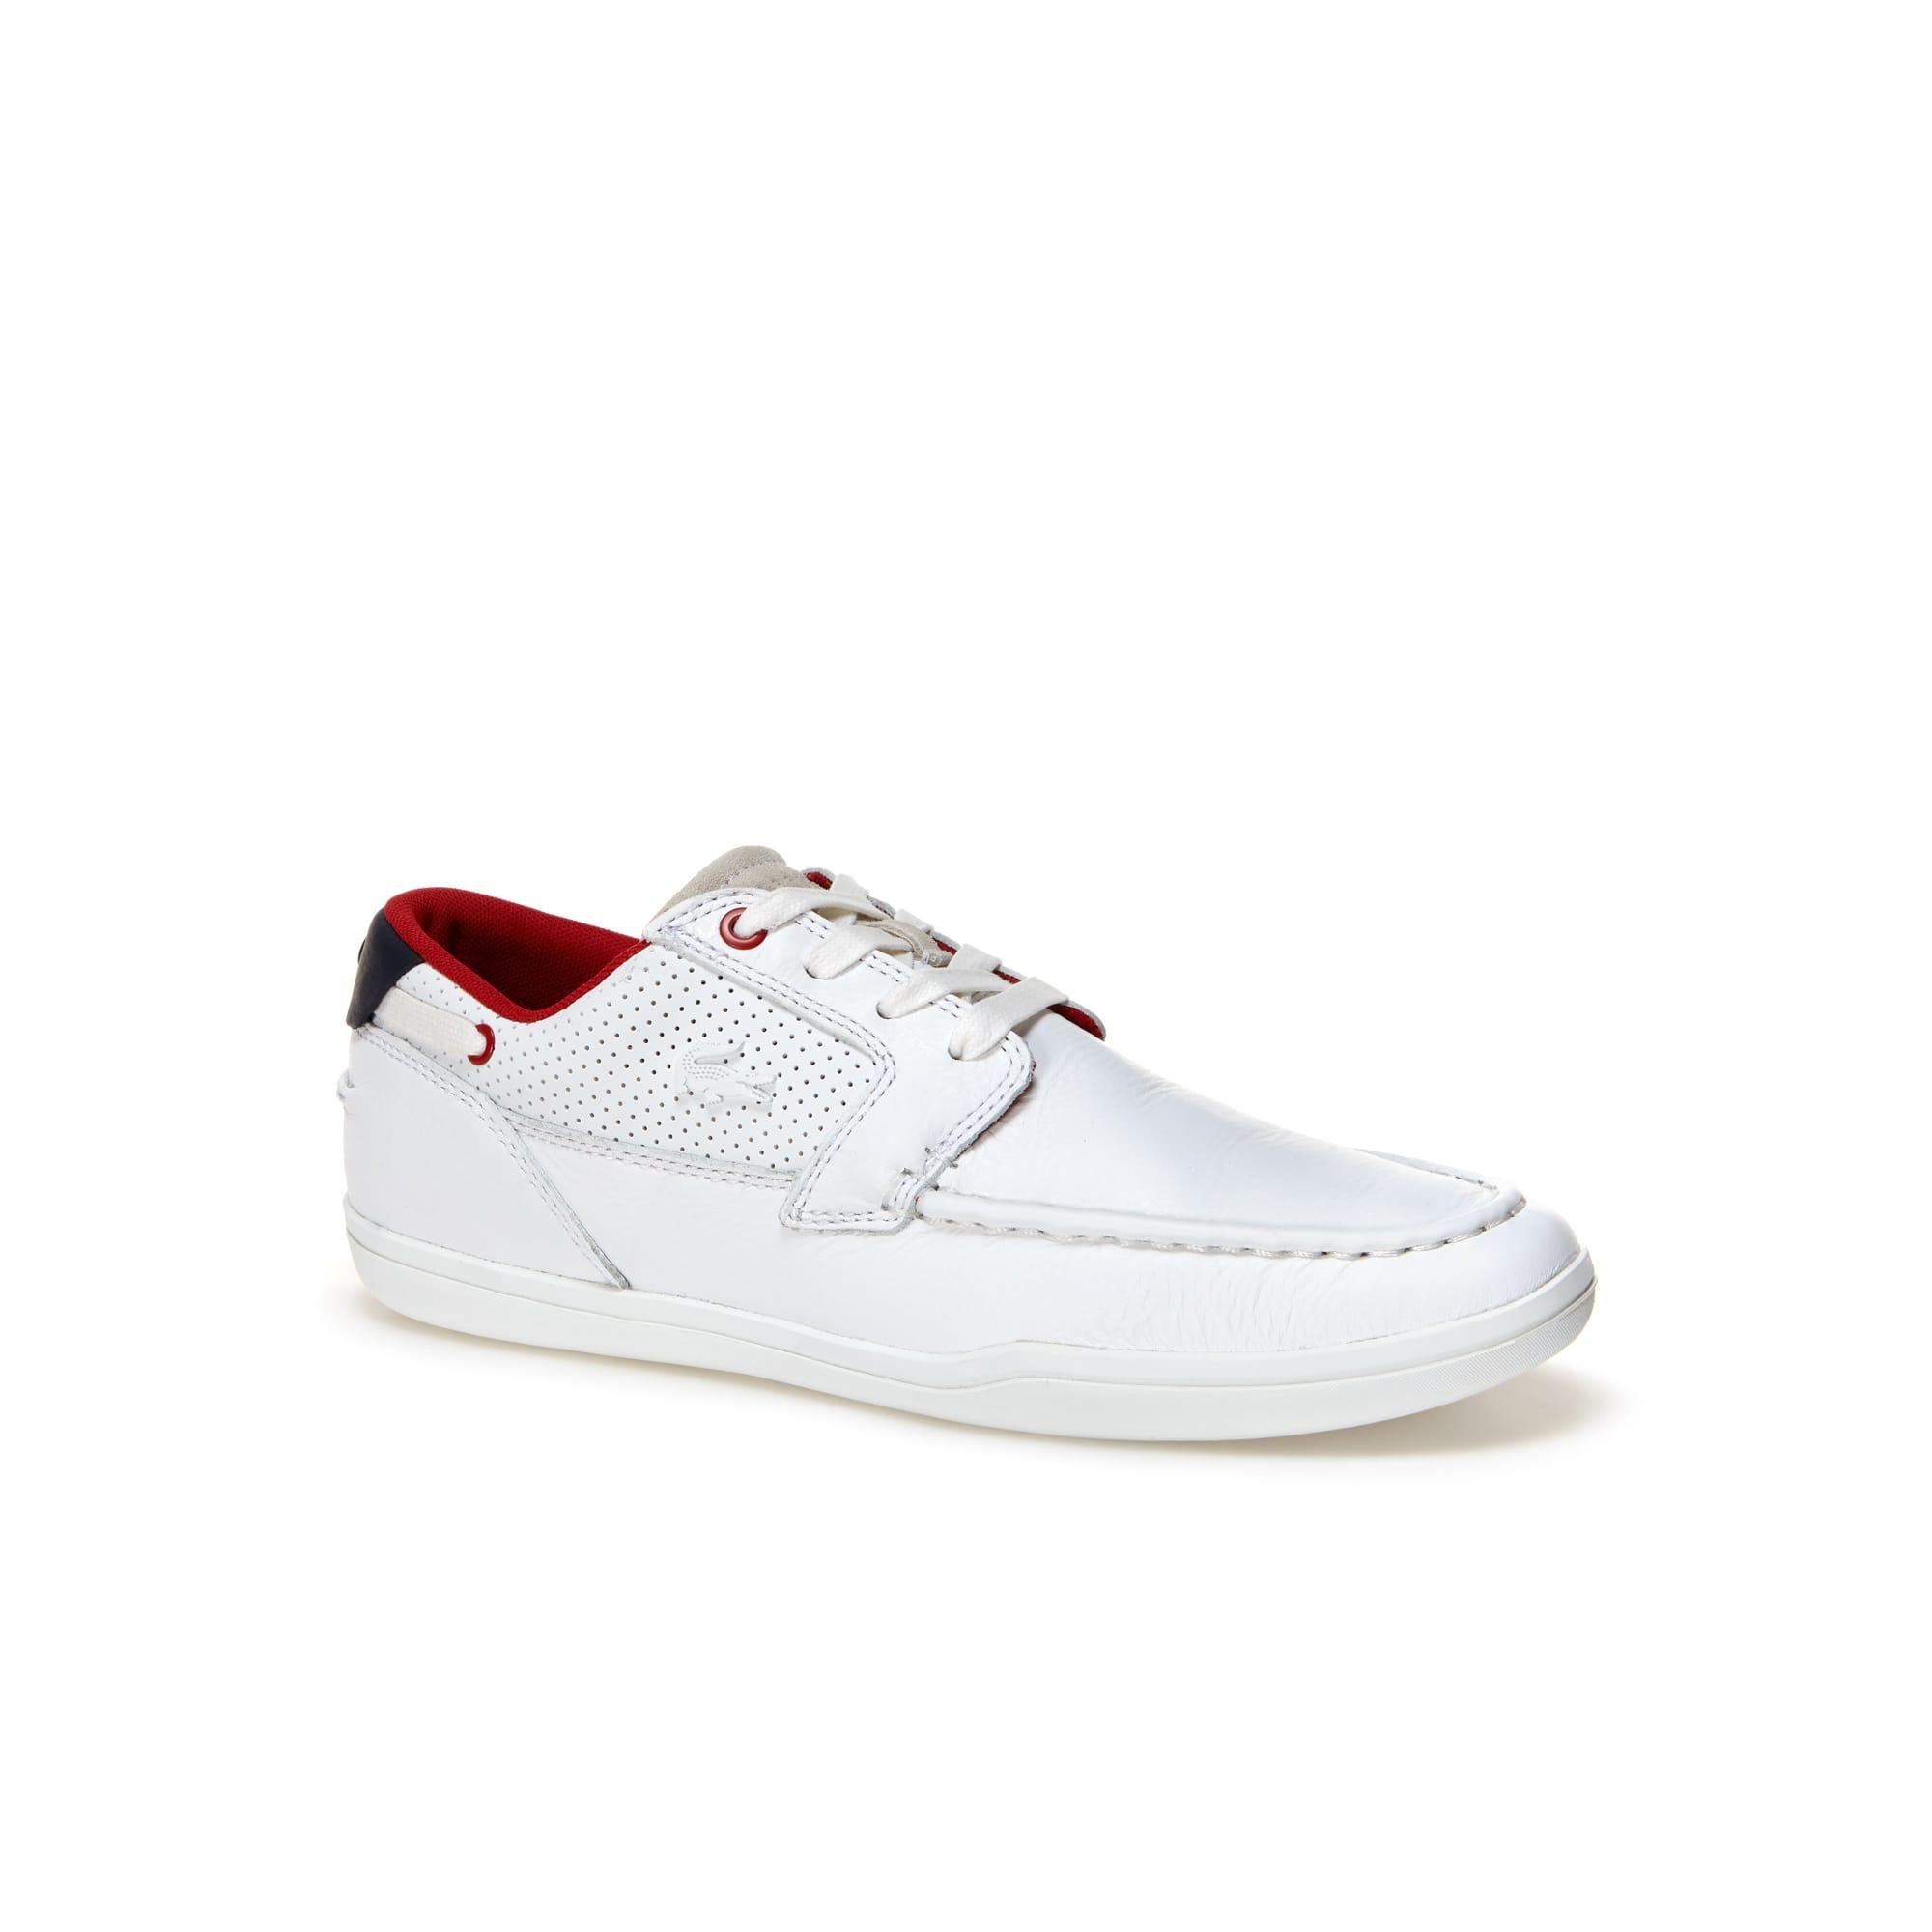 Men's Deck-Minimal Leather Sneakers